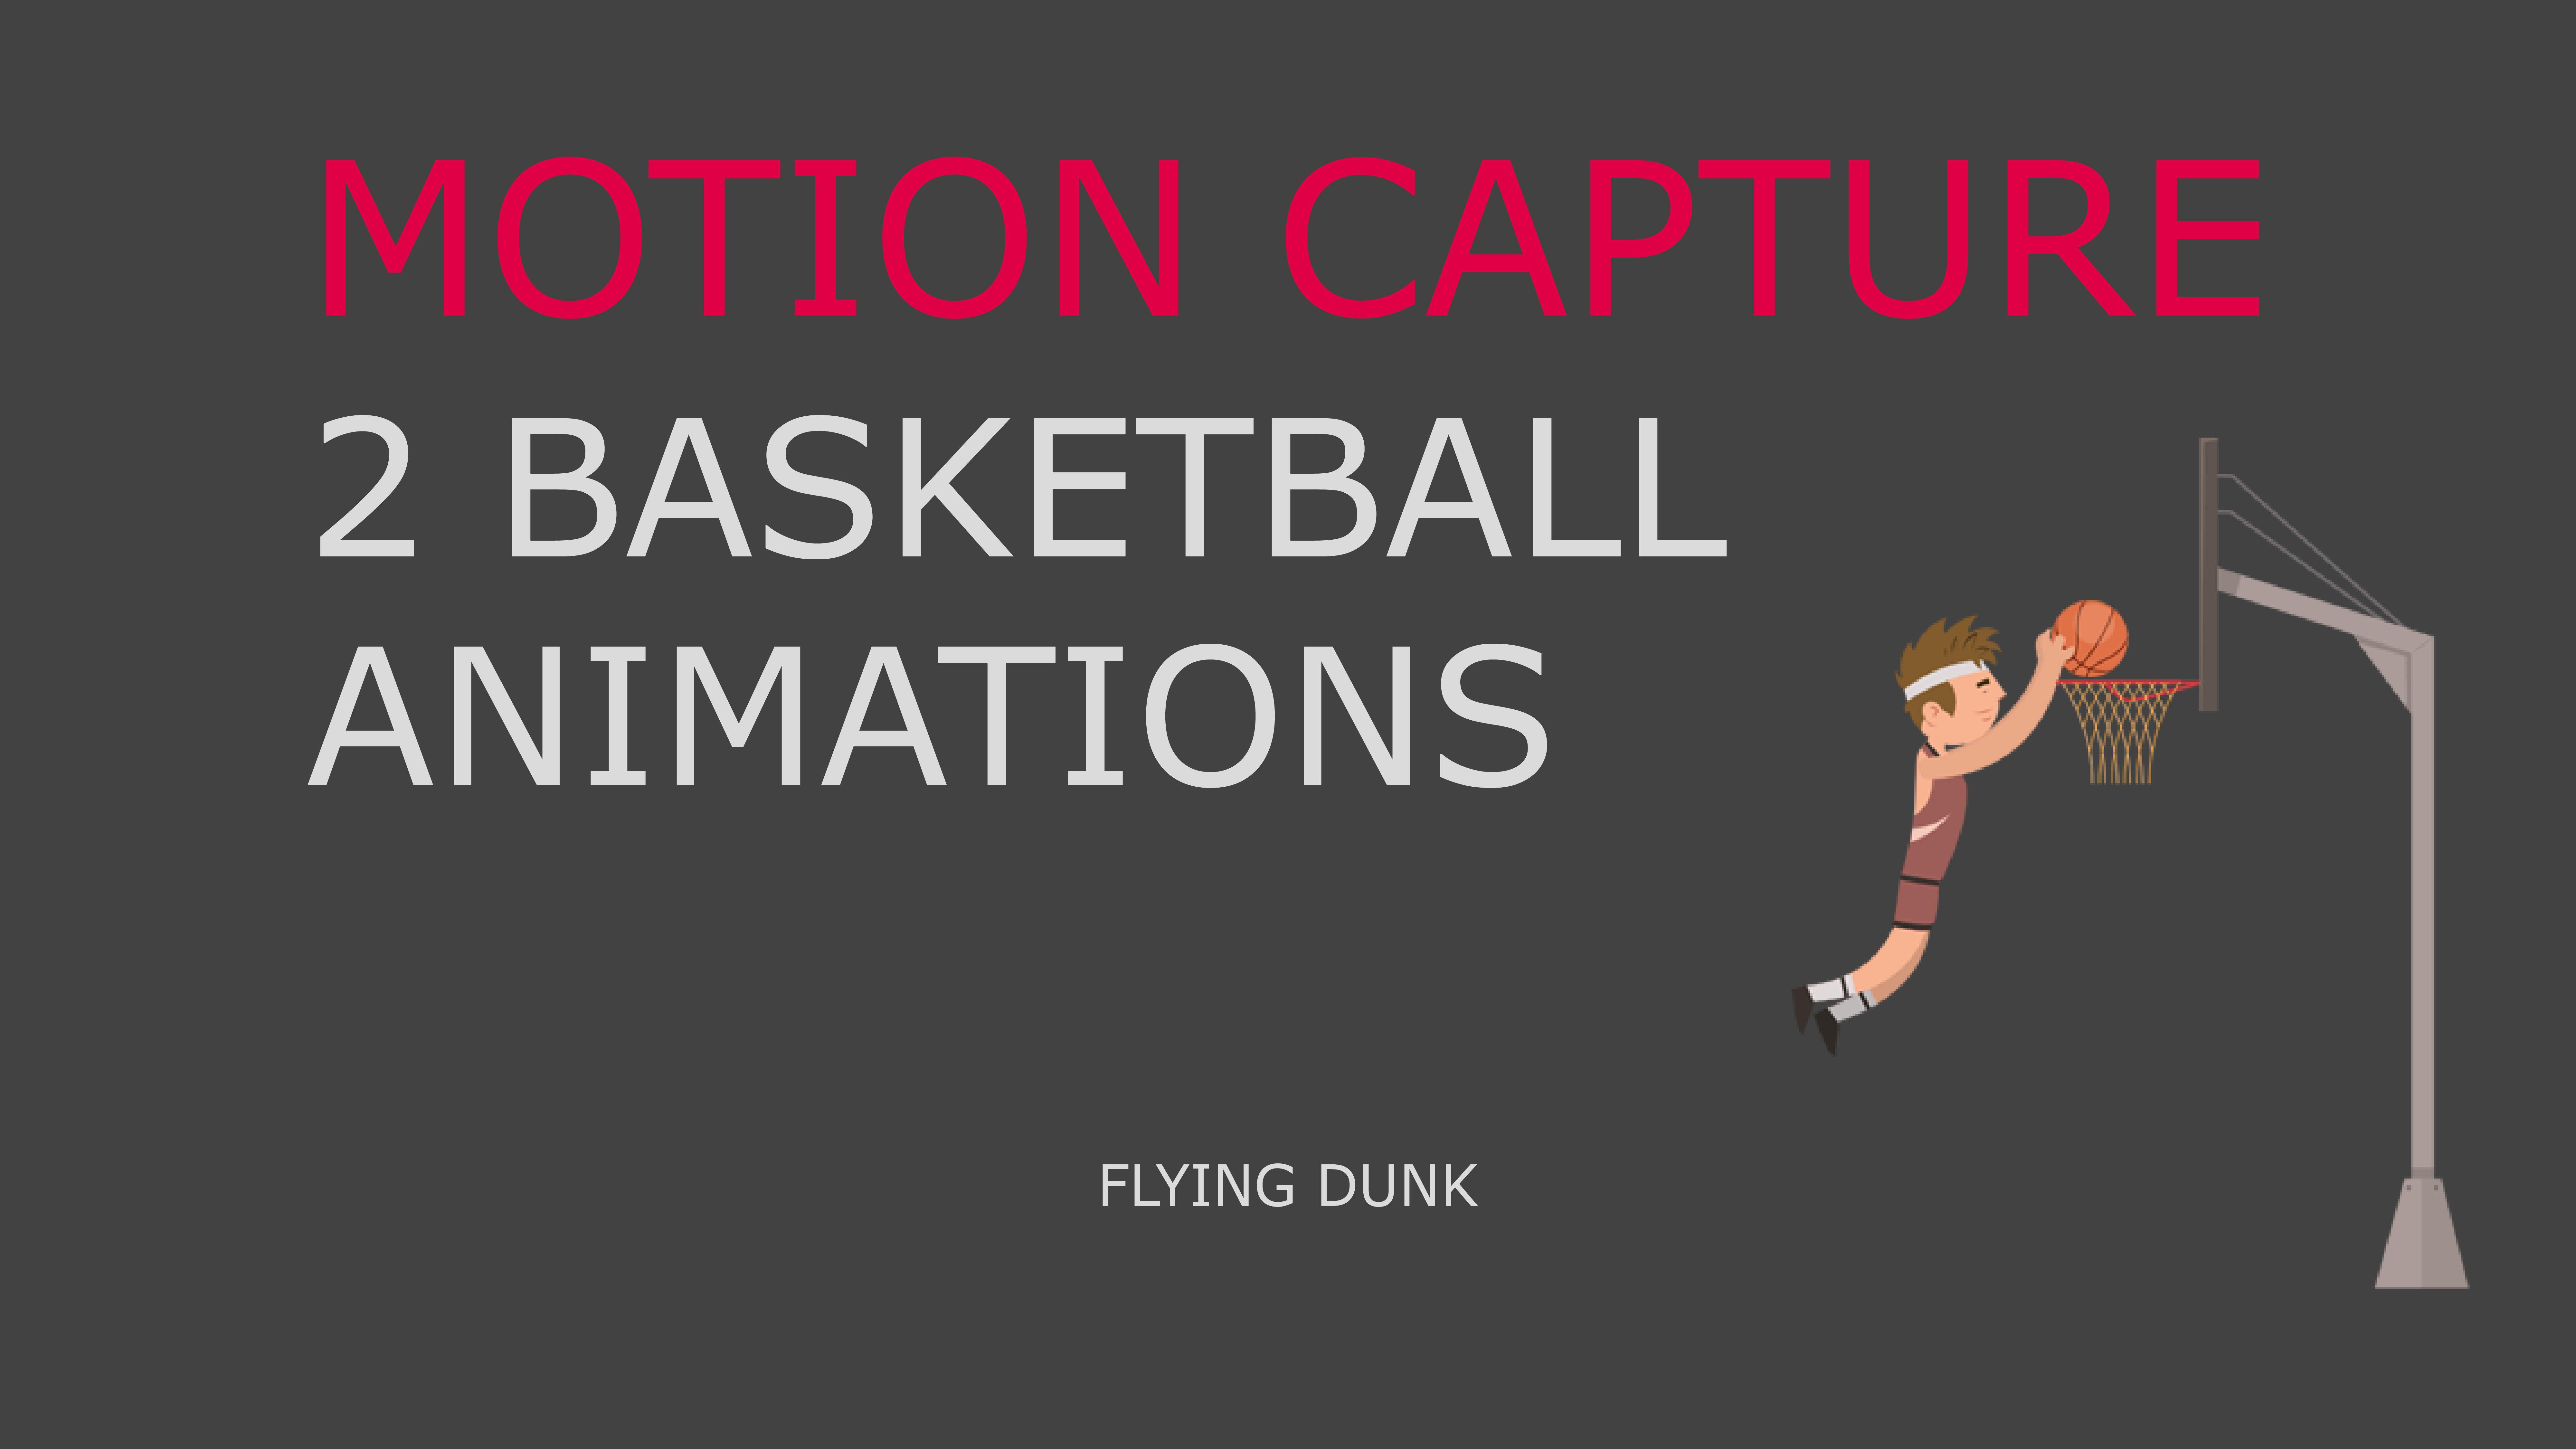 Basketball motion capture 3D mode flying dunk